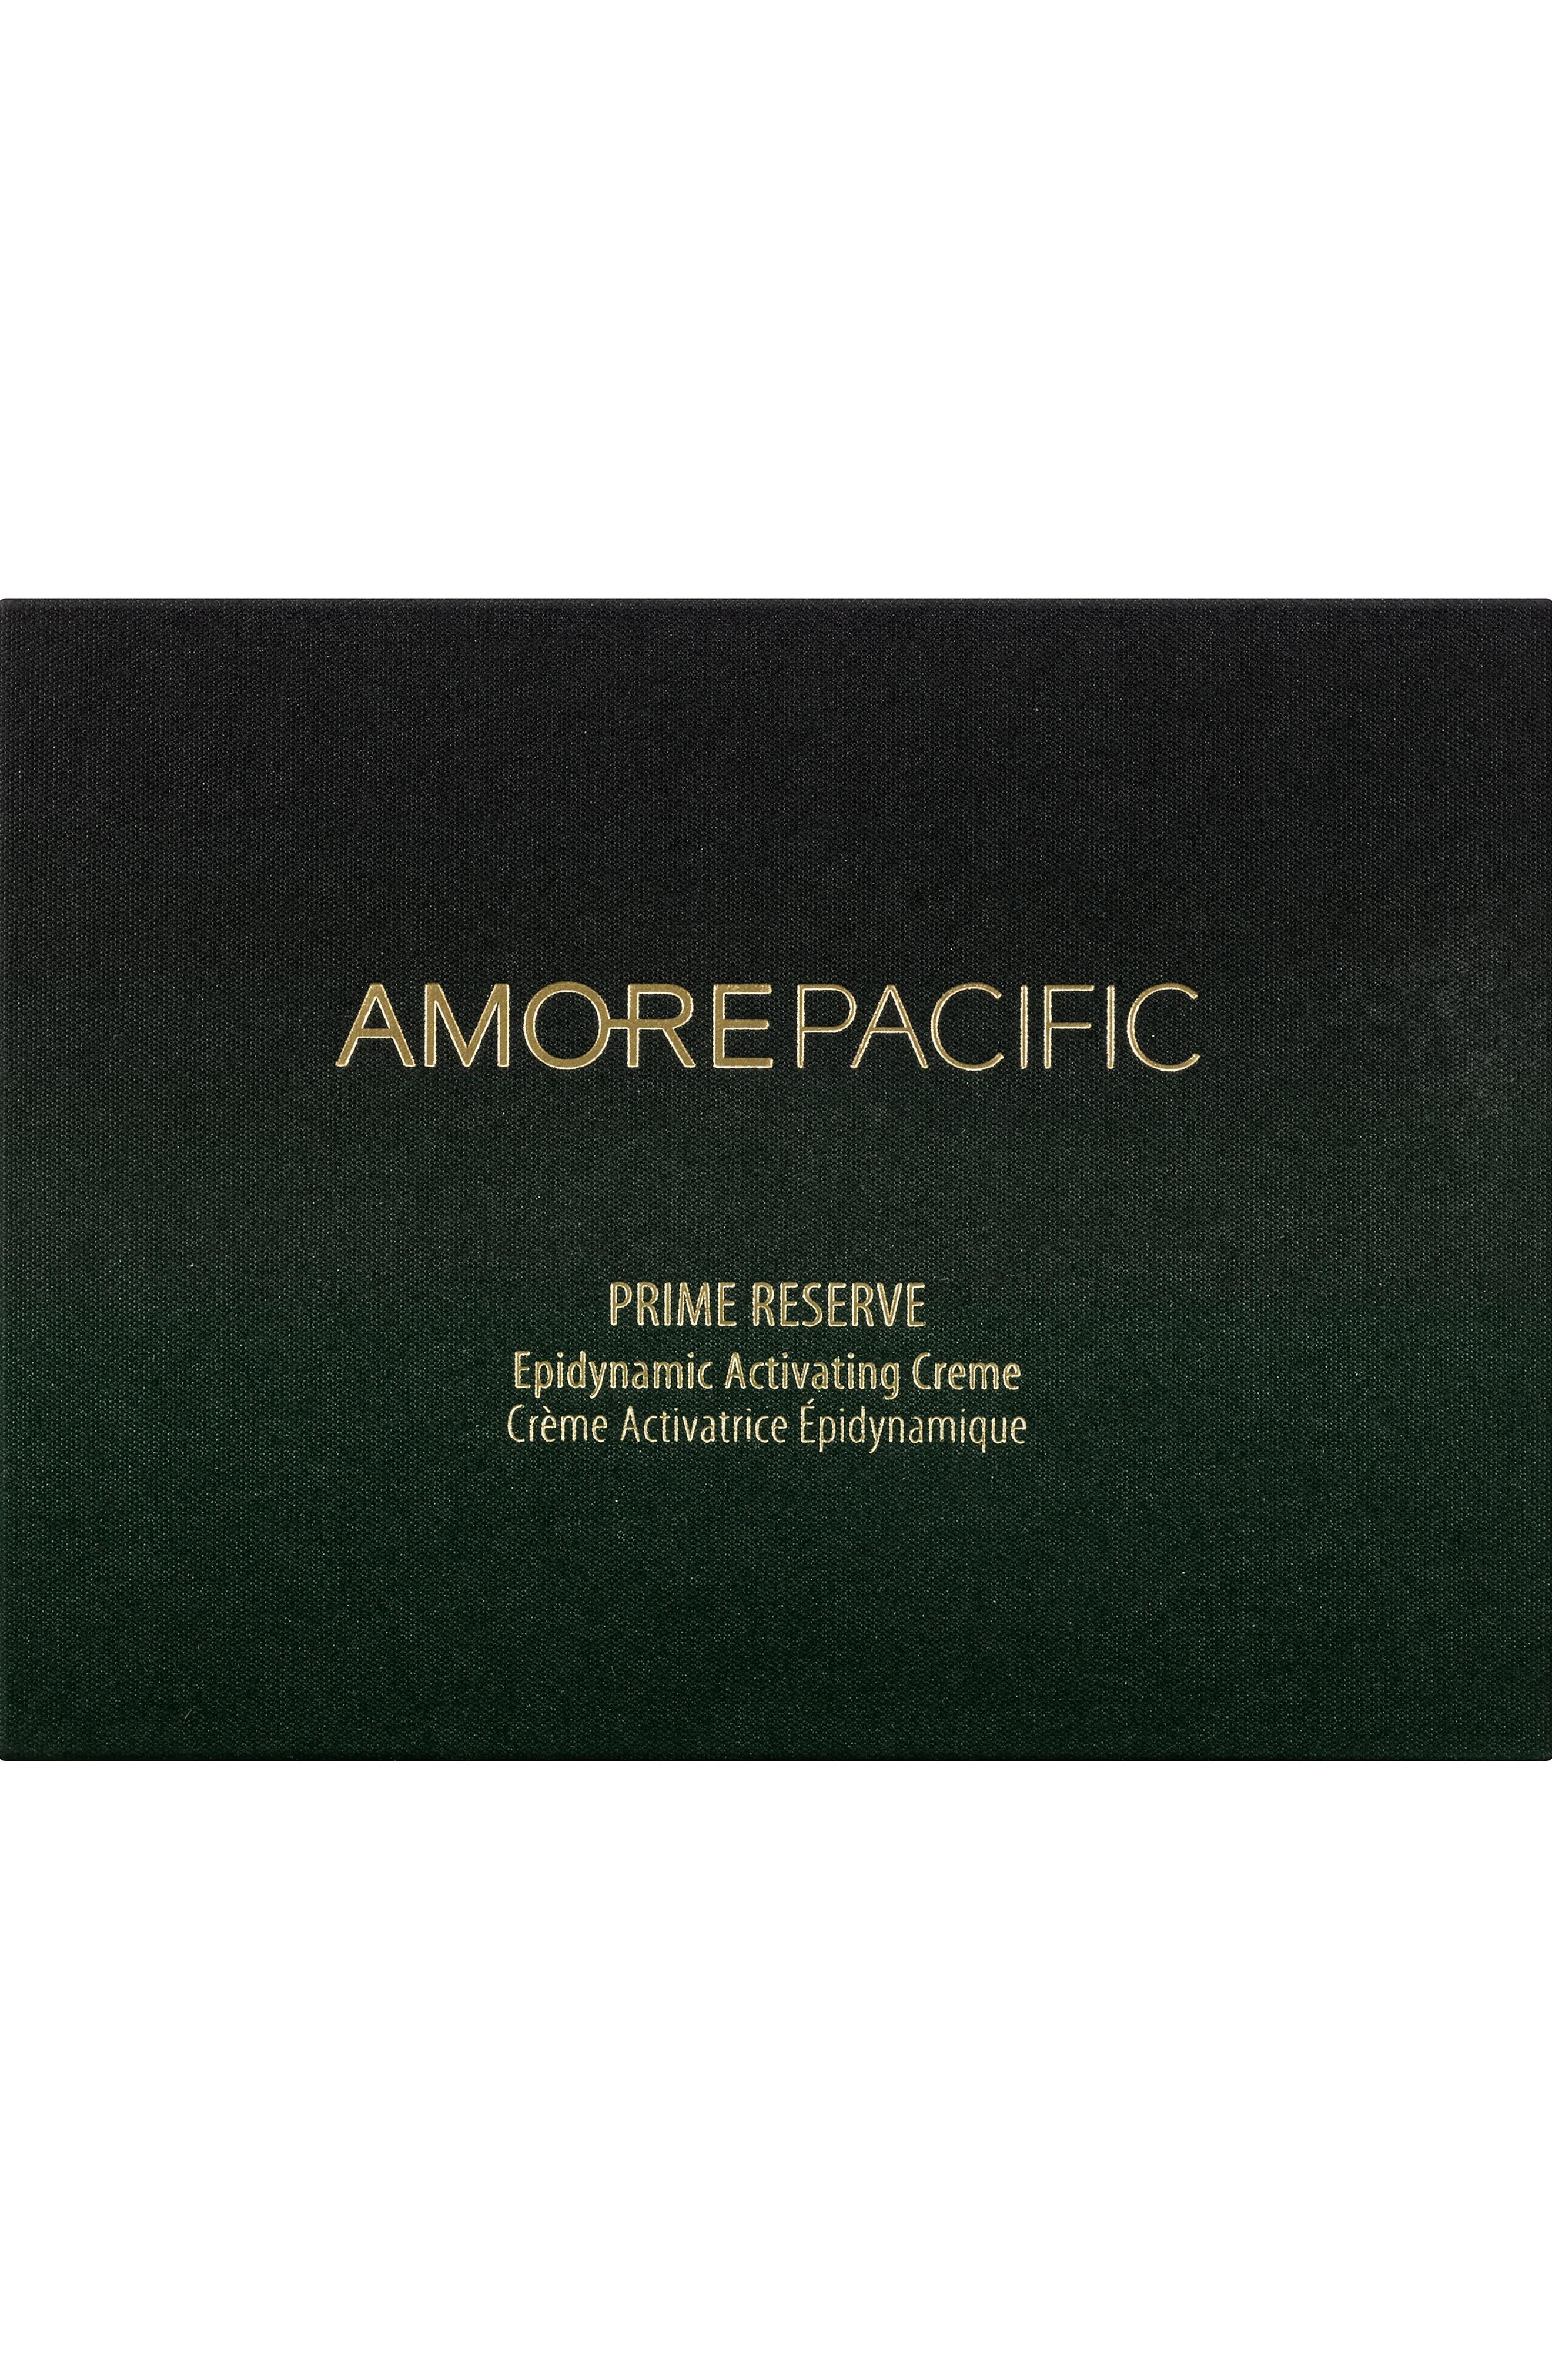 AMOREPACIFIC,                             Prime Reserve Epidynamic Activating Creme,                             Alternate thumbnail 3, color,                             000